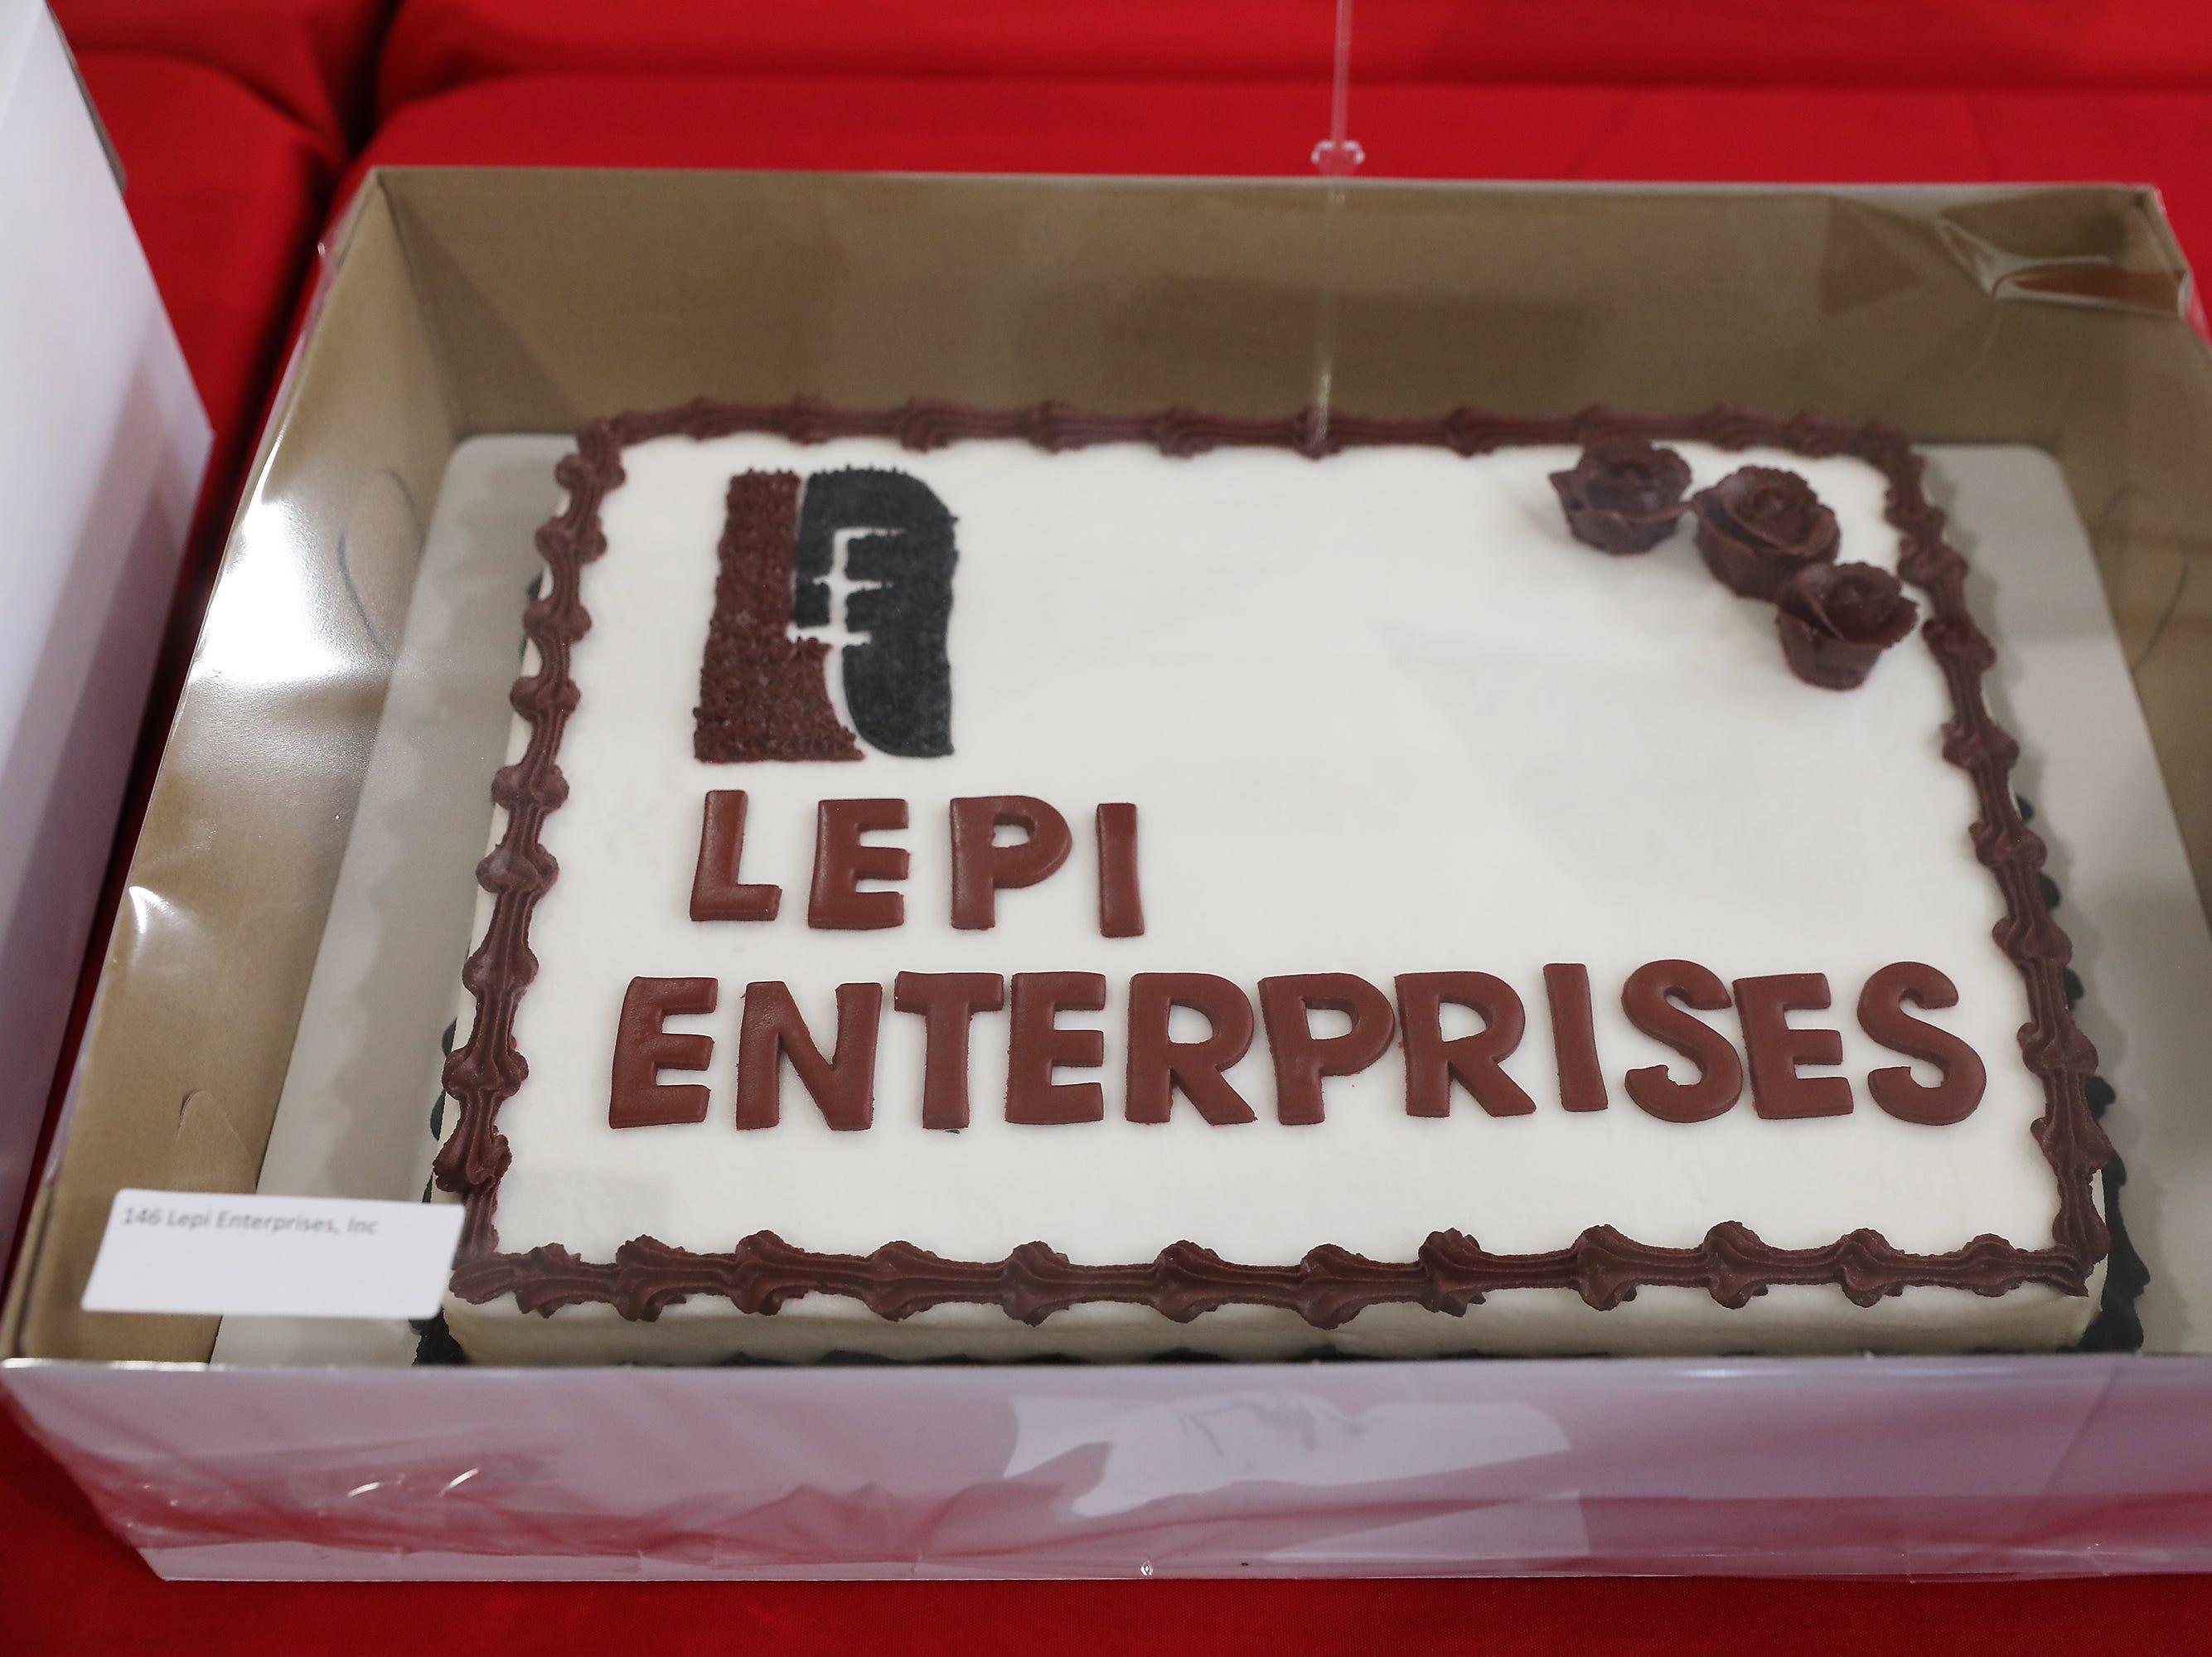 3:15 P.M. Thursday cake 146 Lepi Enterprises - 4 rounds of golf at Vista View, cart, golf balls, tees; $150